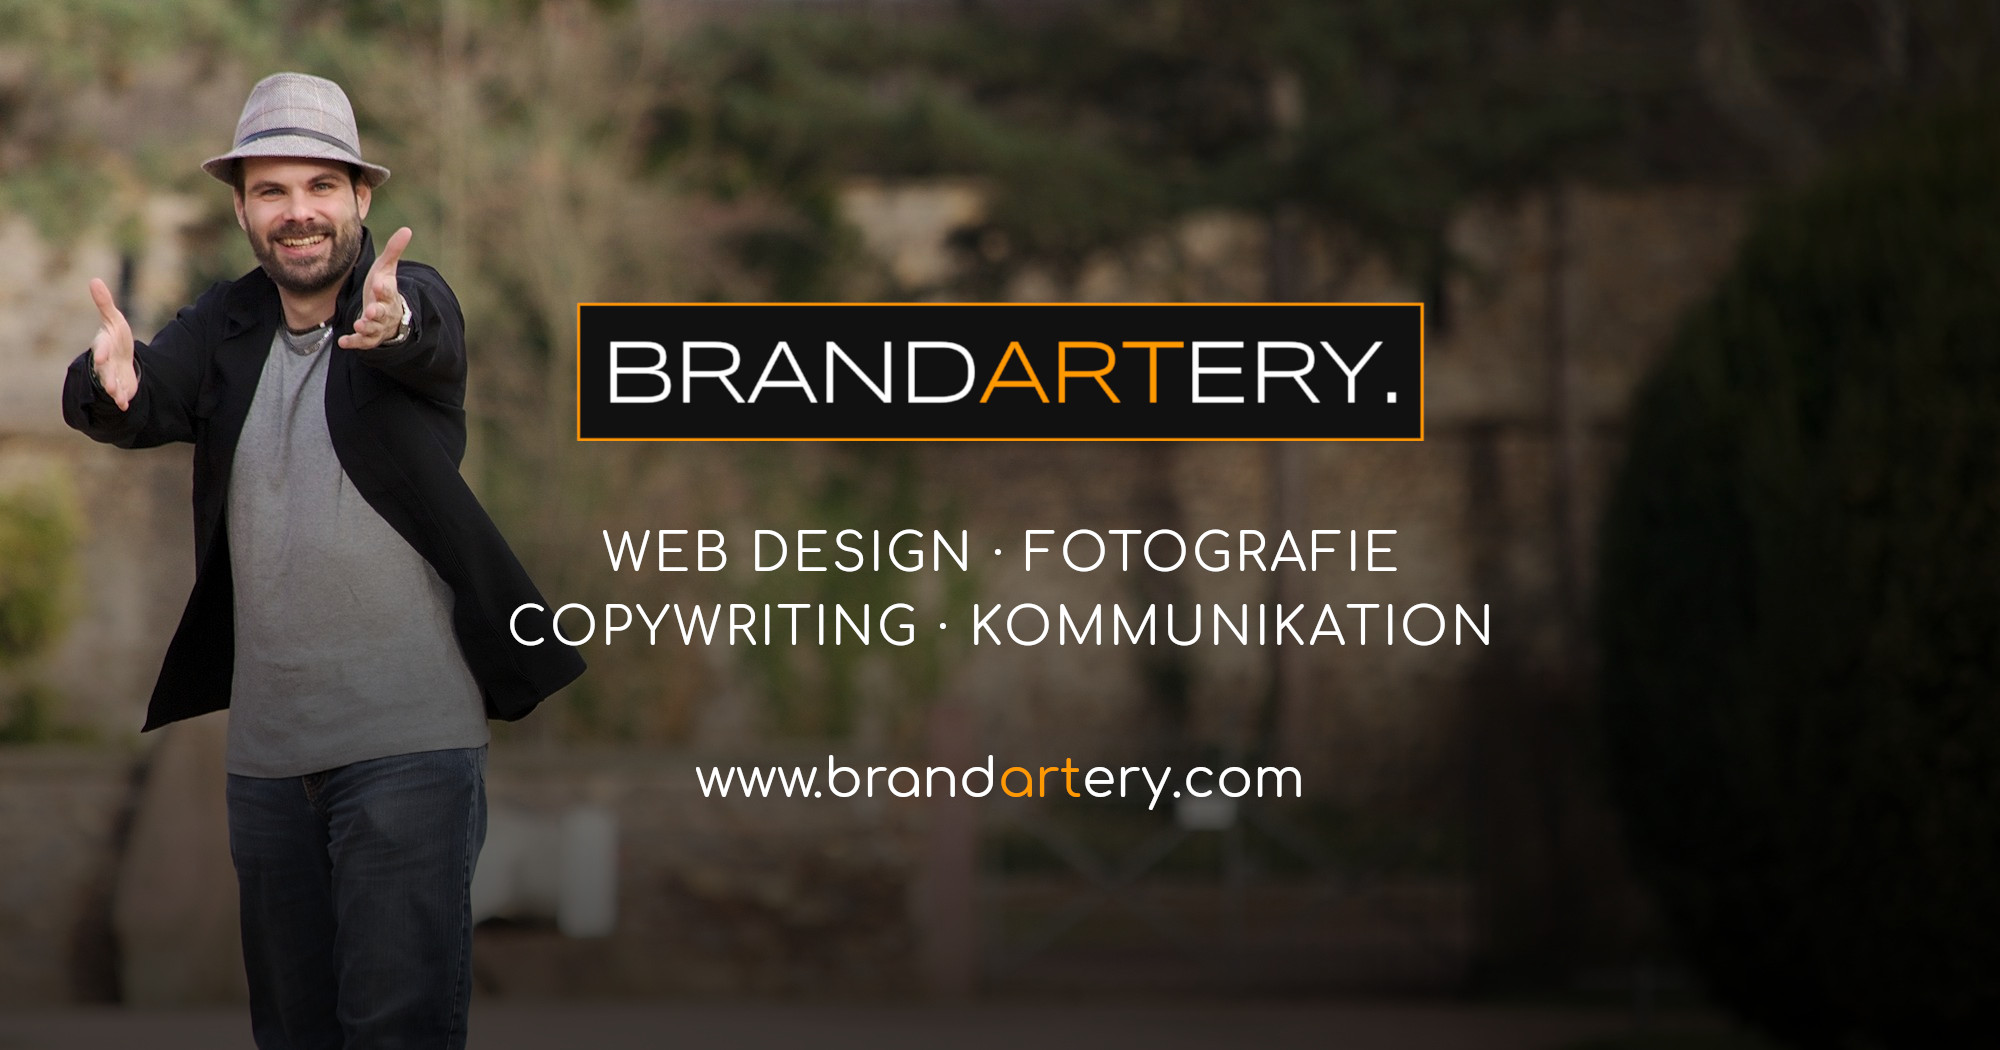 OpenGraph: Facebook » Webdesigner Saarbrücken · Fotografie · Copywriting · Storytelling » Brand Artery